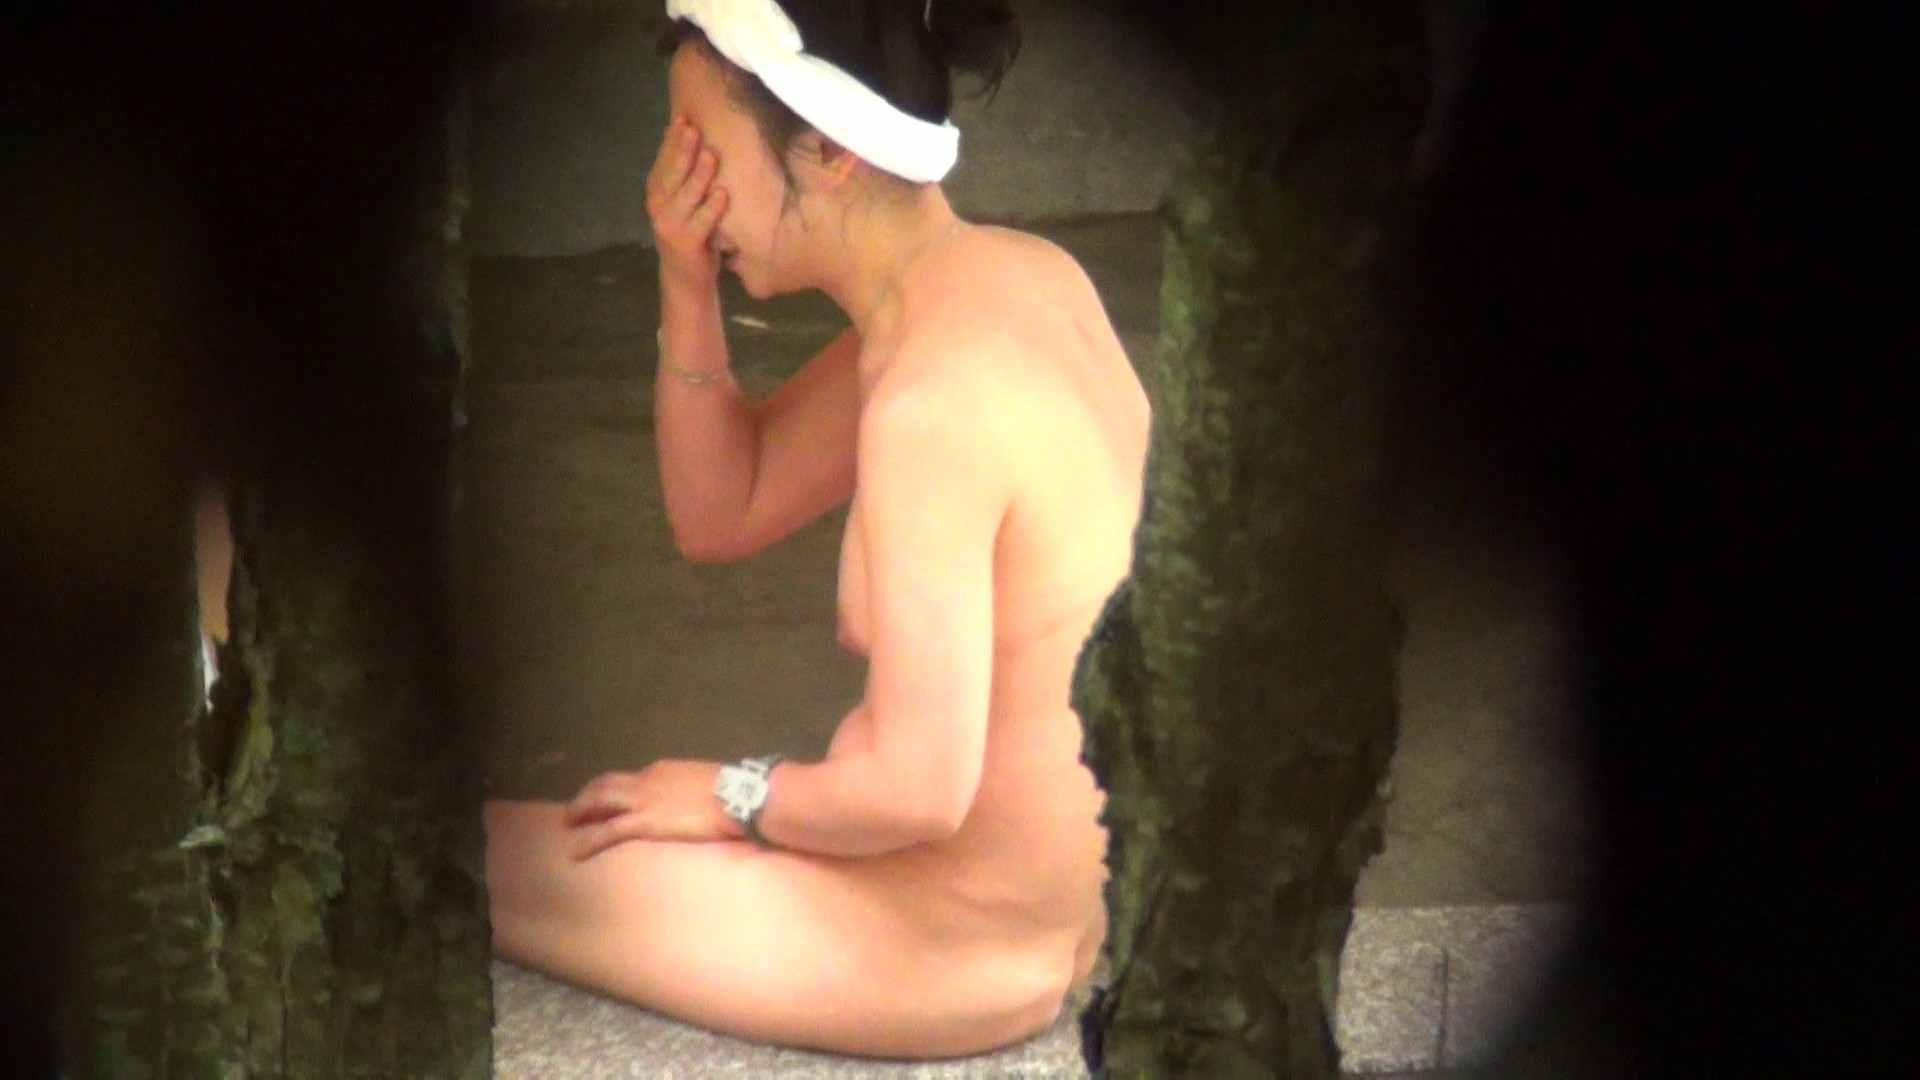 Aquaな露天風呂Vol.310 盗撮師作品 セックス画像 72pic 71